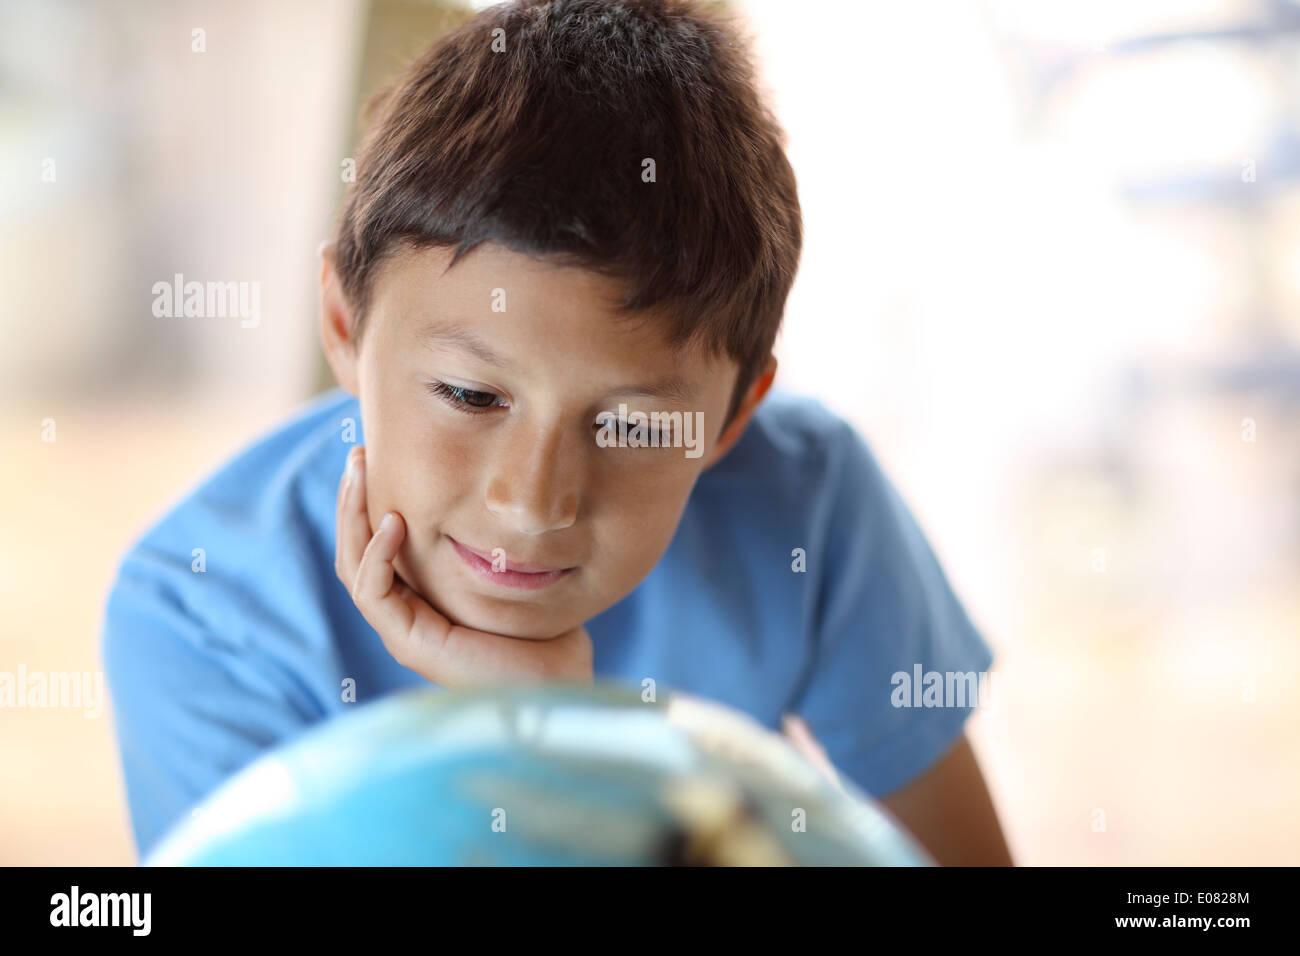 Y0Young boy rêve de parcourir comme il regarde un globe Photo Stock